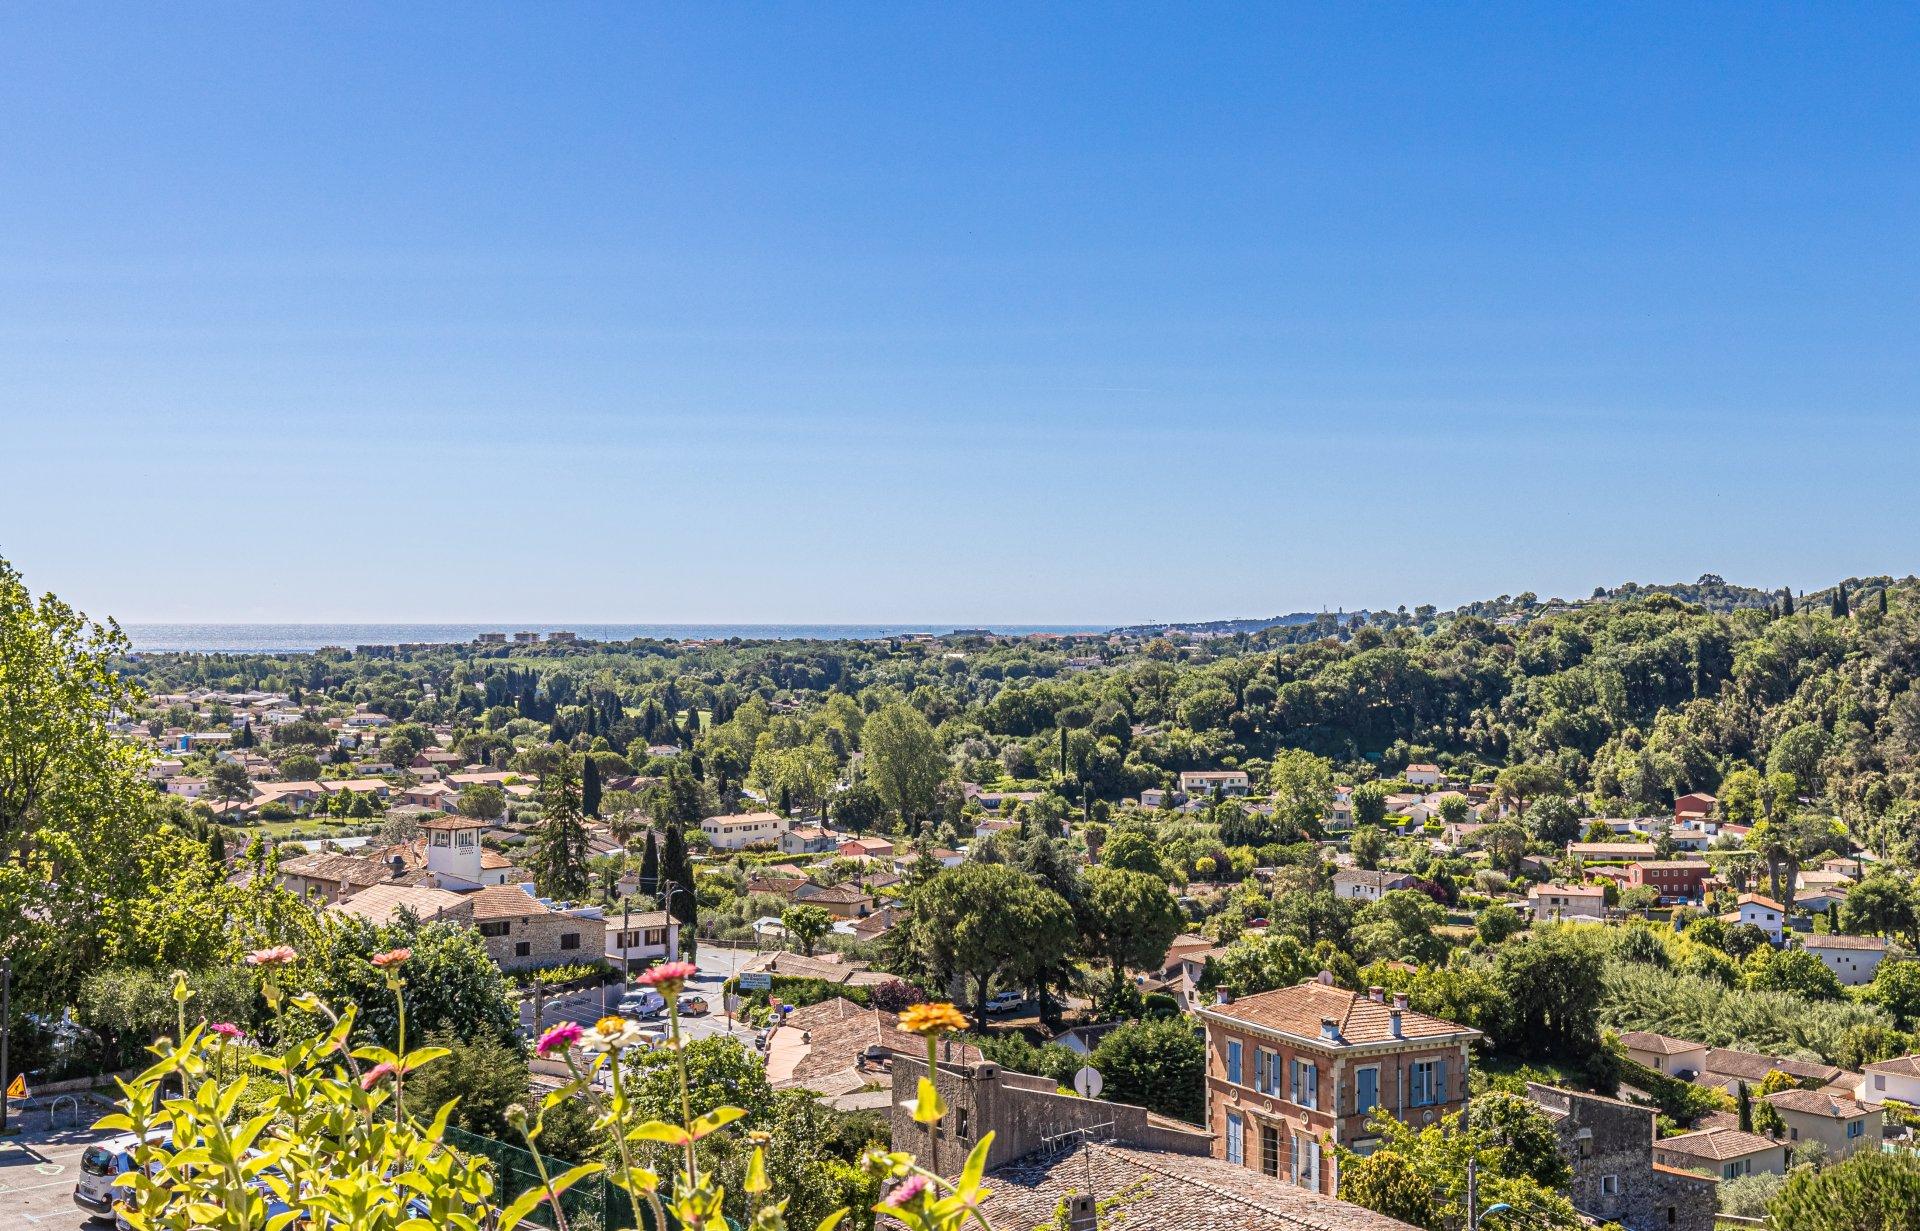 3-bed, top floor apartment, terrace, sea view, luxury residence, pool, Biot village